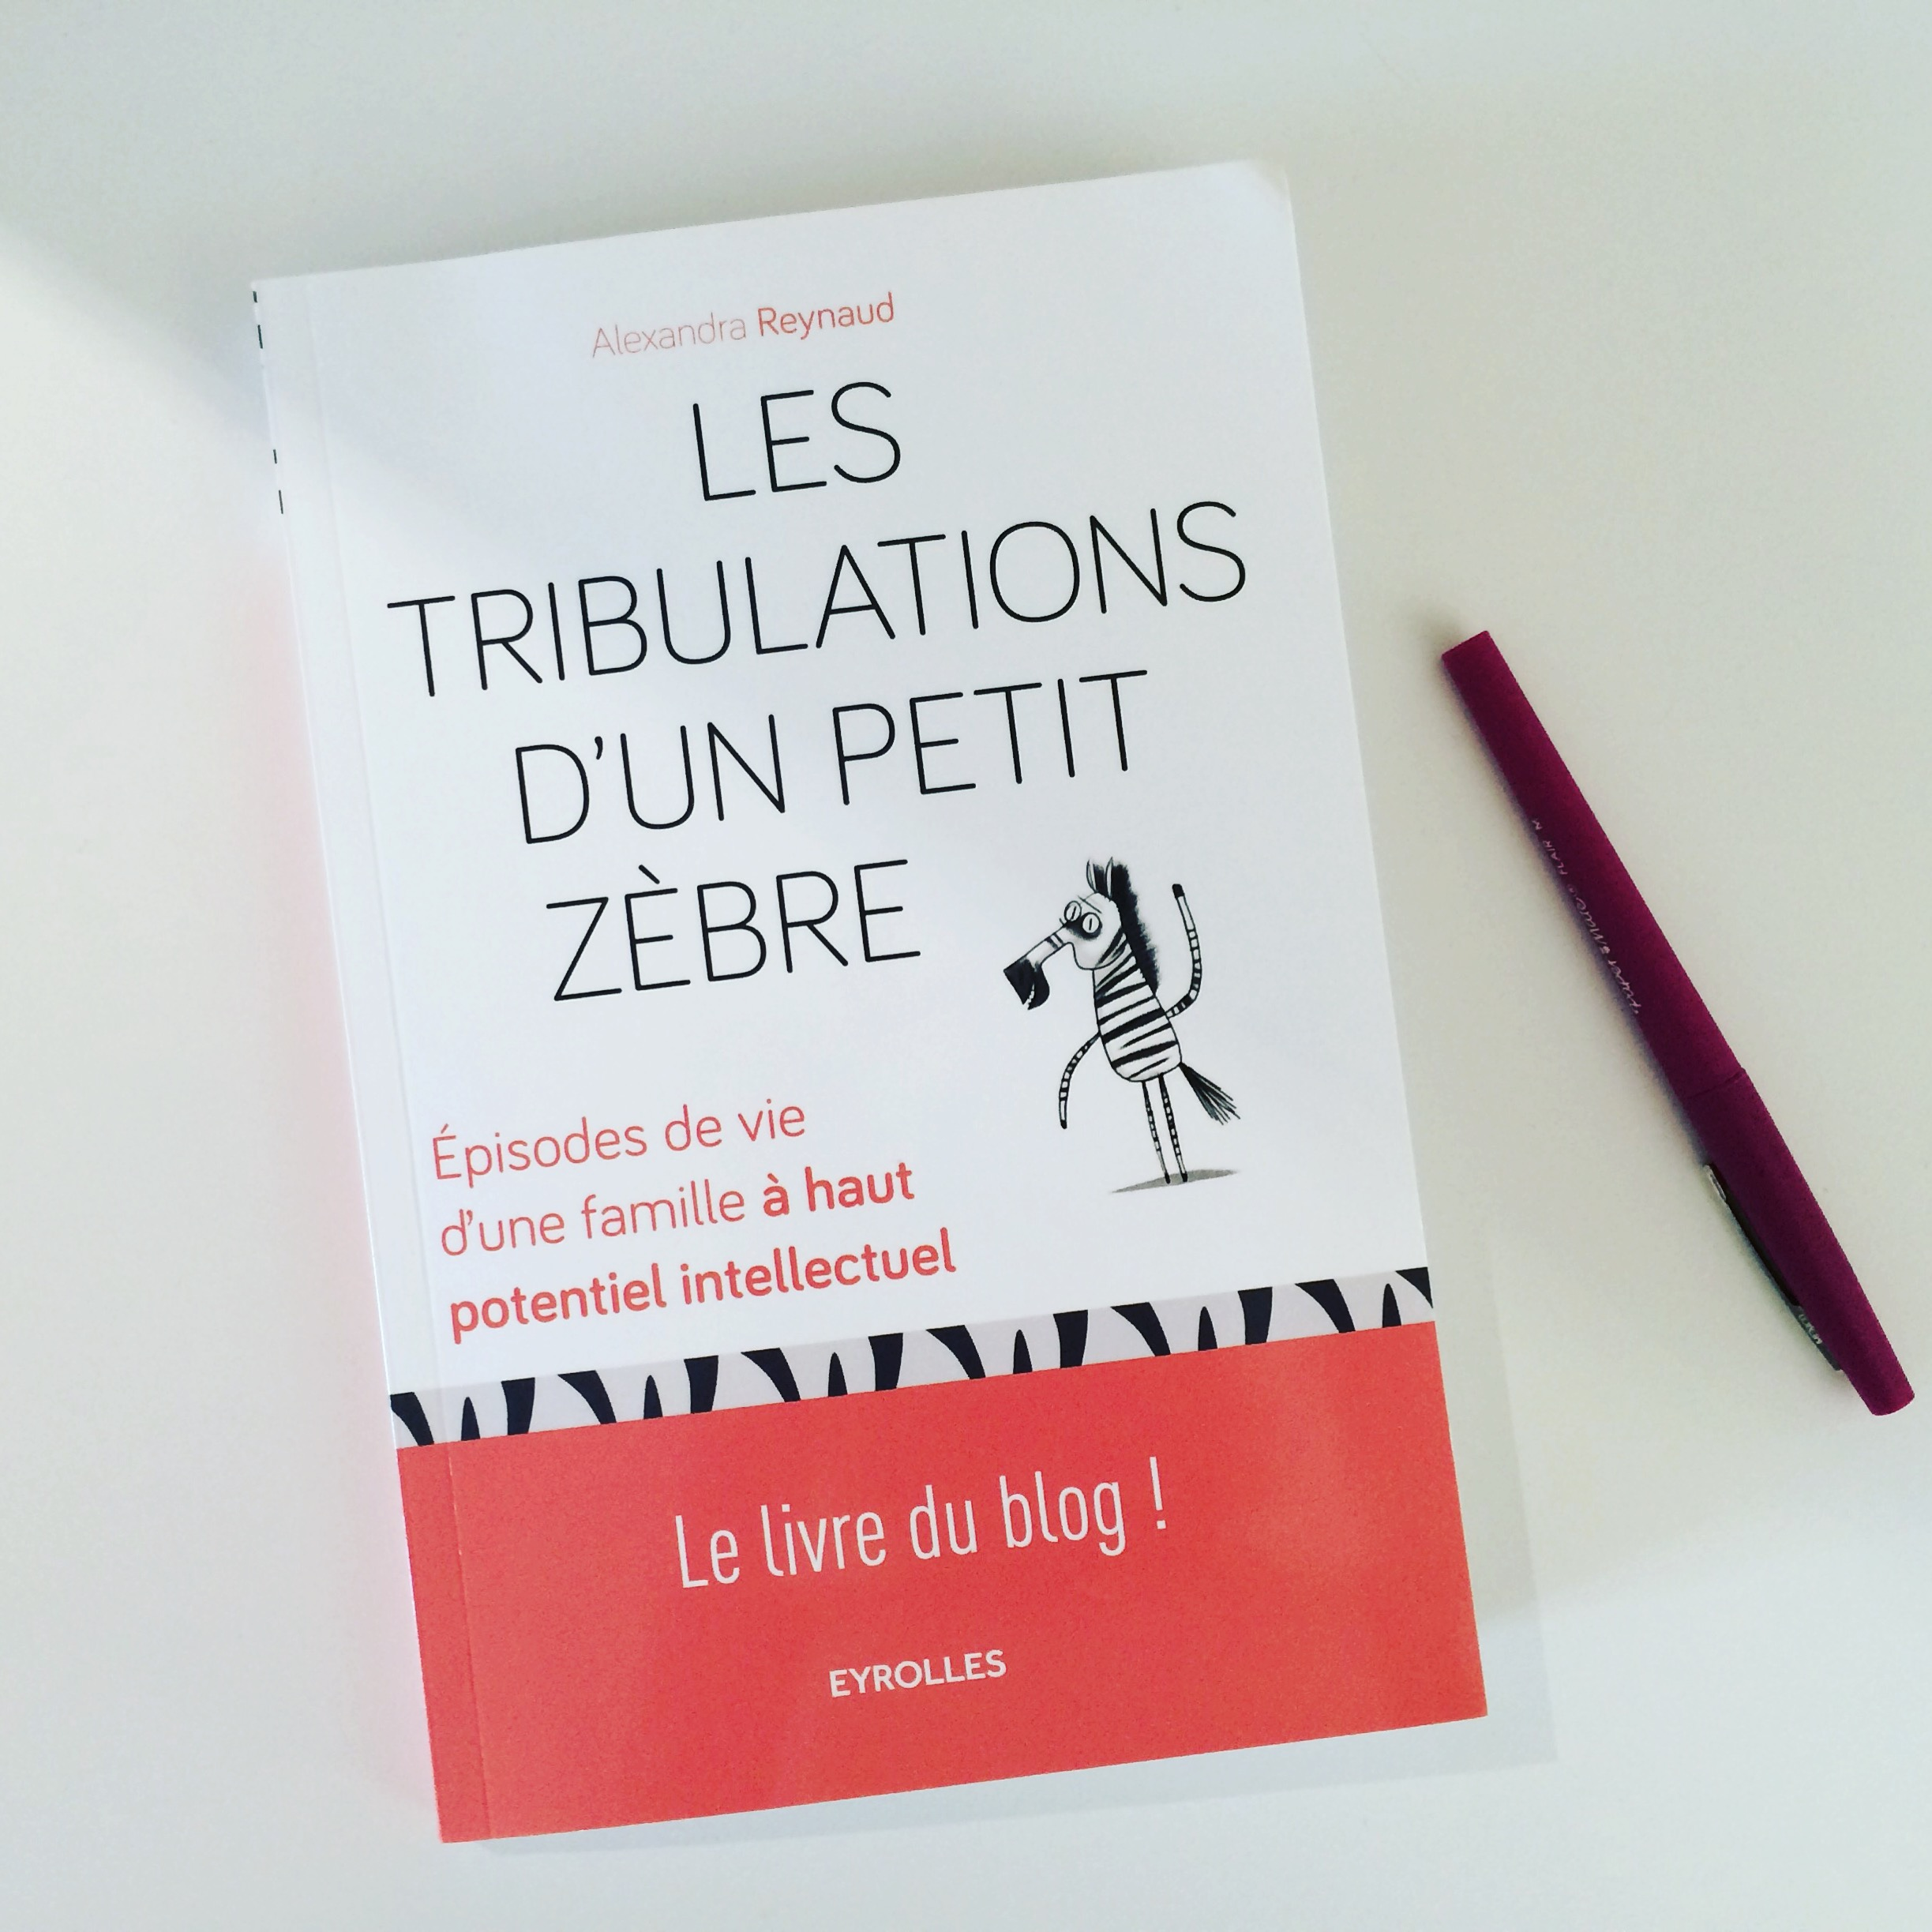 les_tribulations_dun_petit_zebre